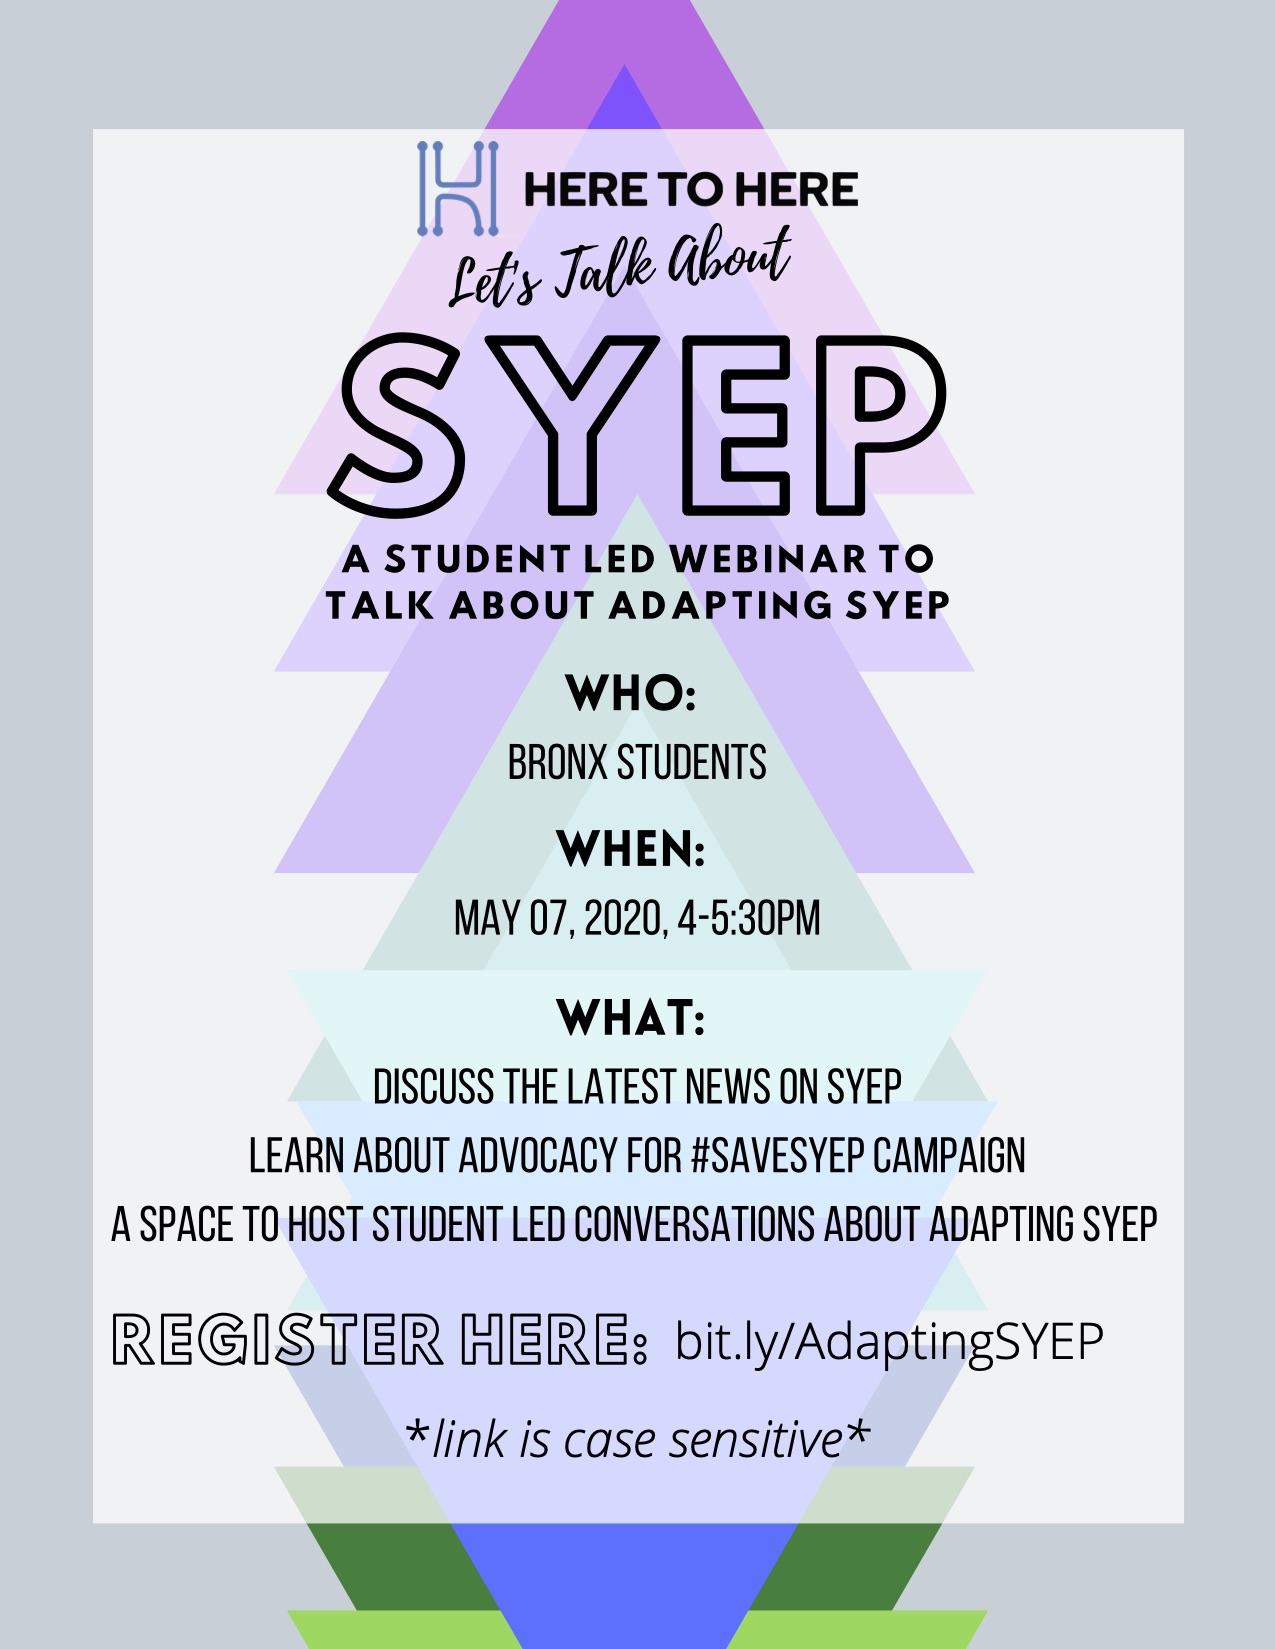 SYEP webinar flyer